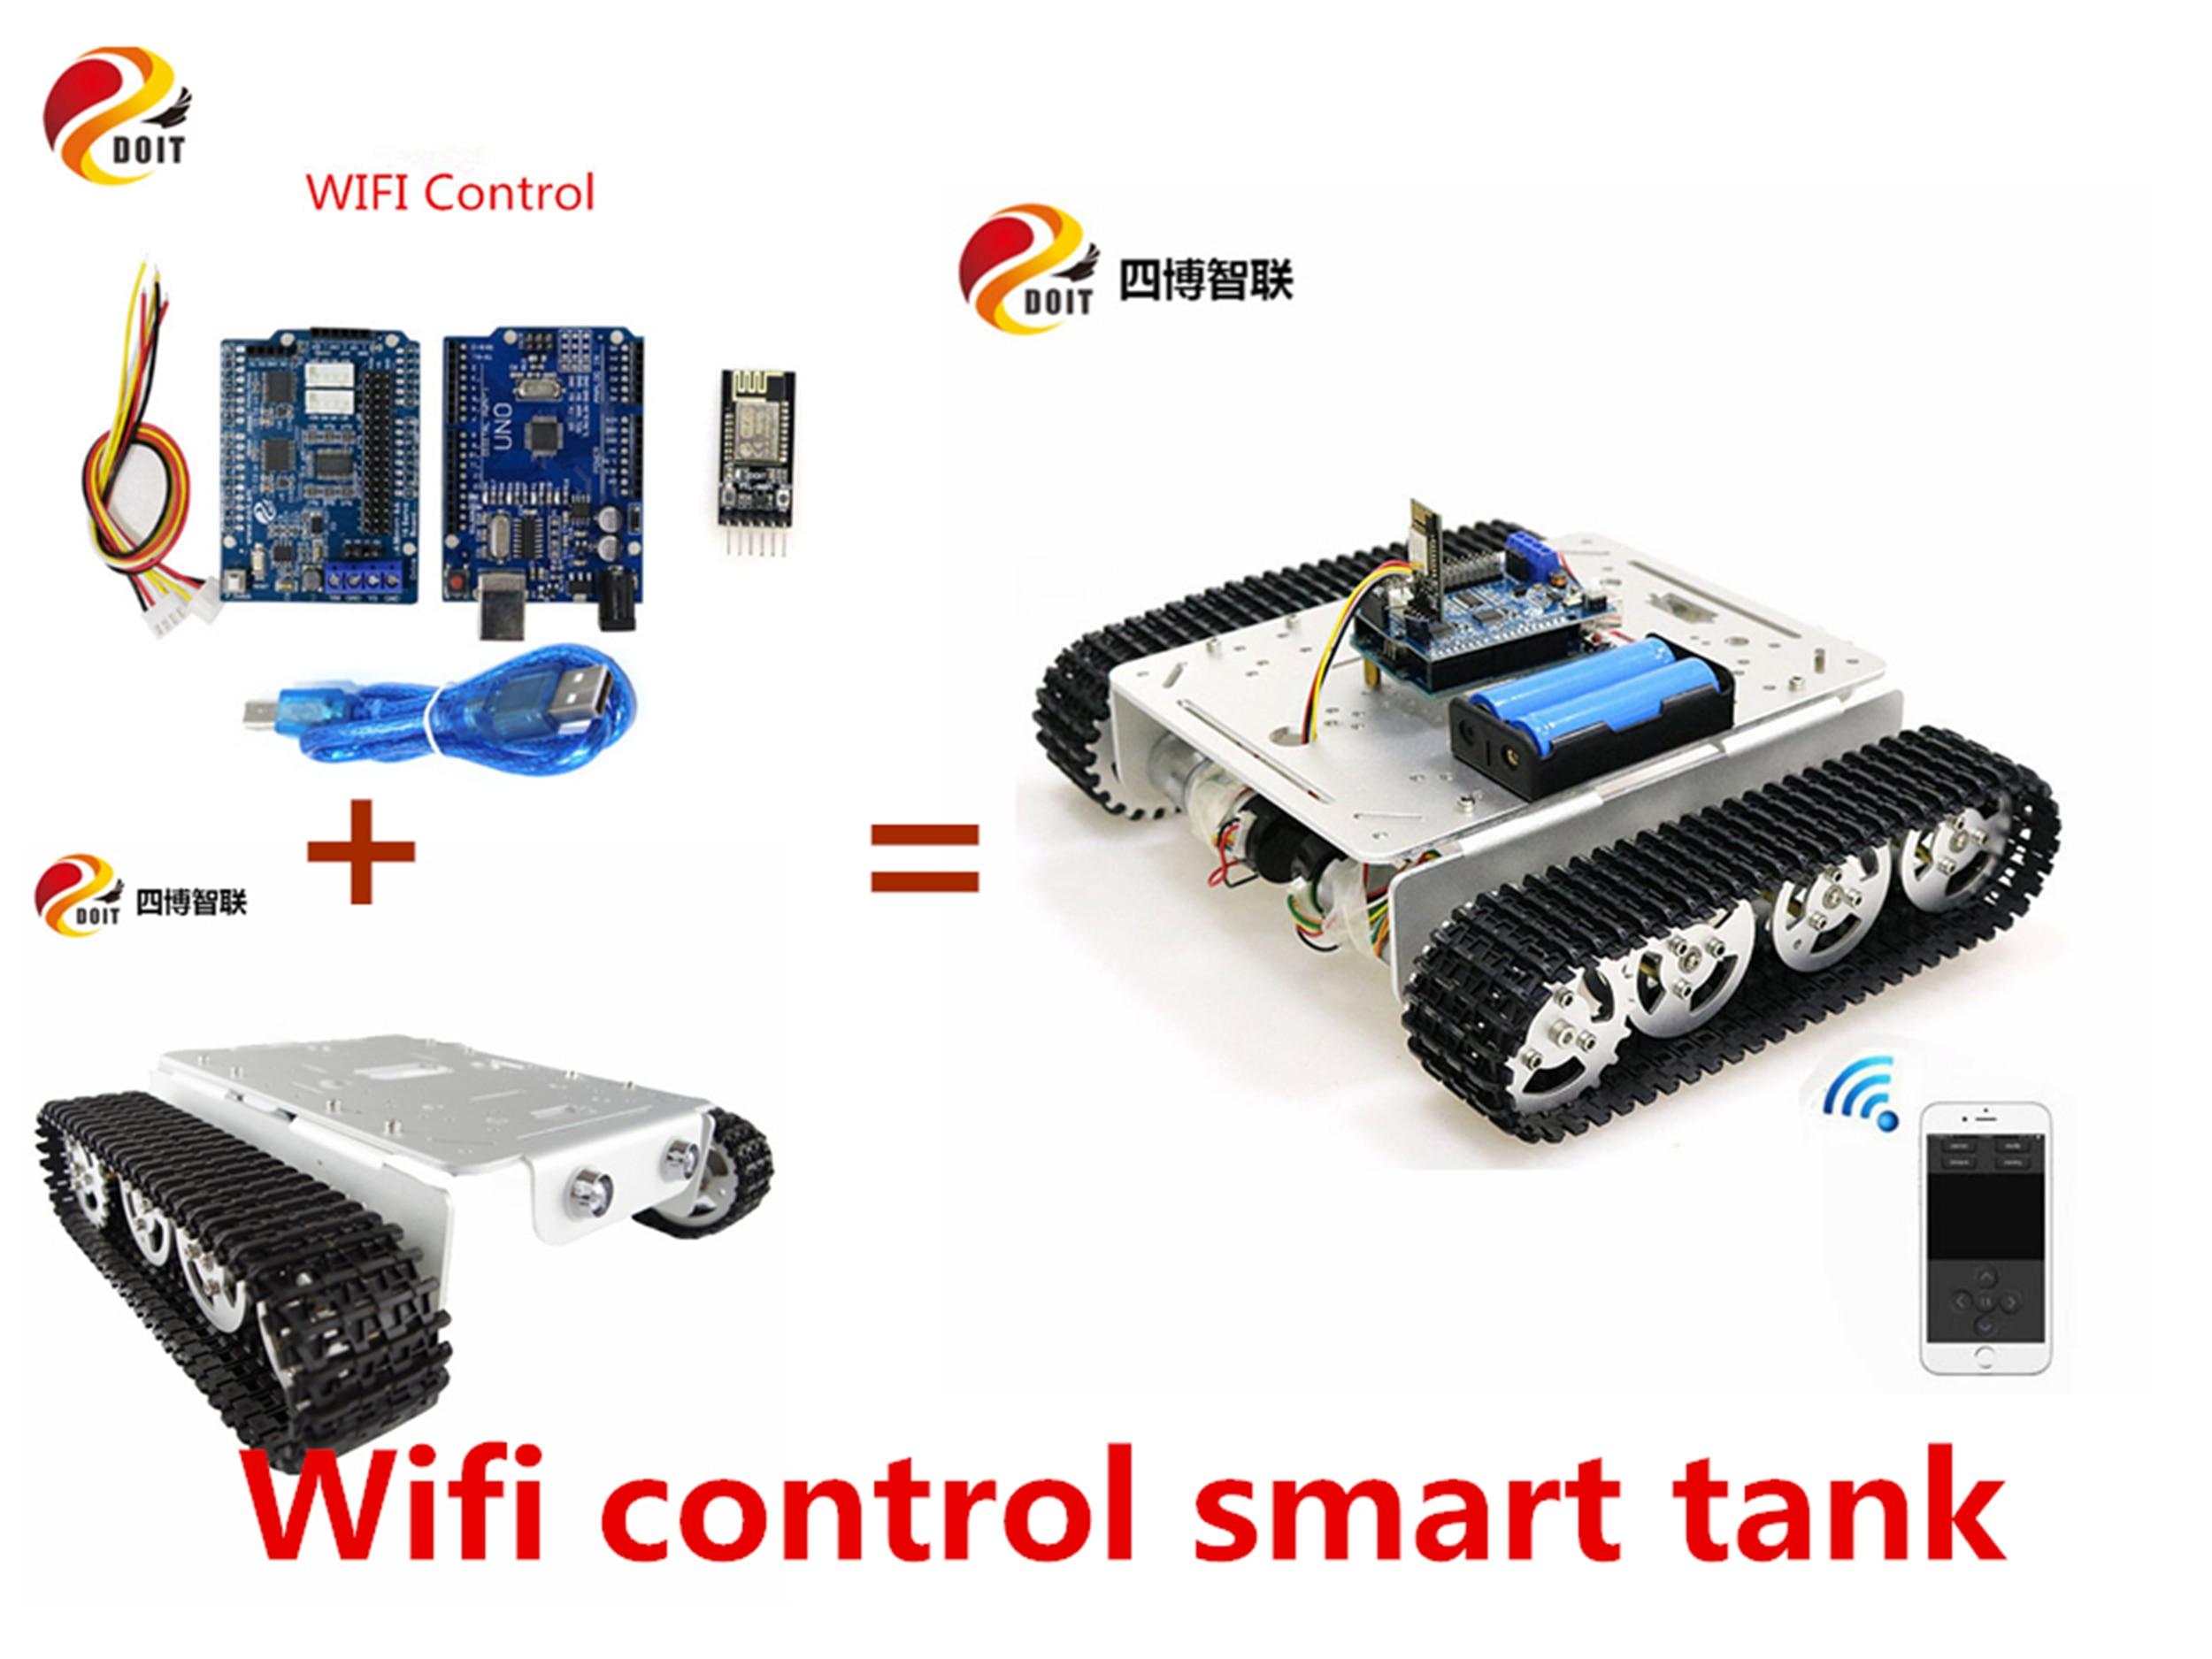 SZDOIT Wifi/Bluetooth/Control de manija T200 Kit de chasis de tanque inteligente de Metal RC seguimiento robotizado educativo DIY para Arduino 12V motores